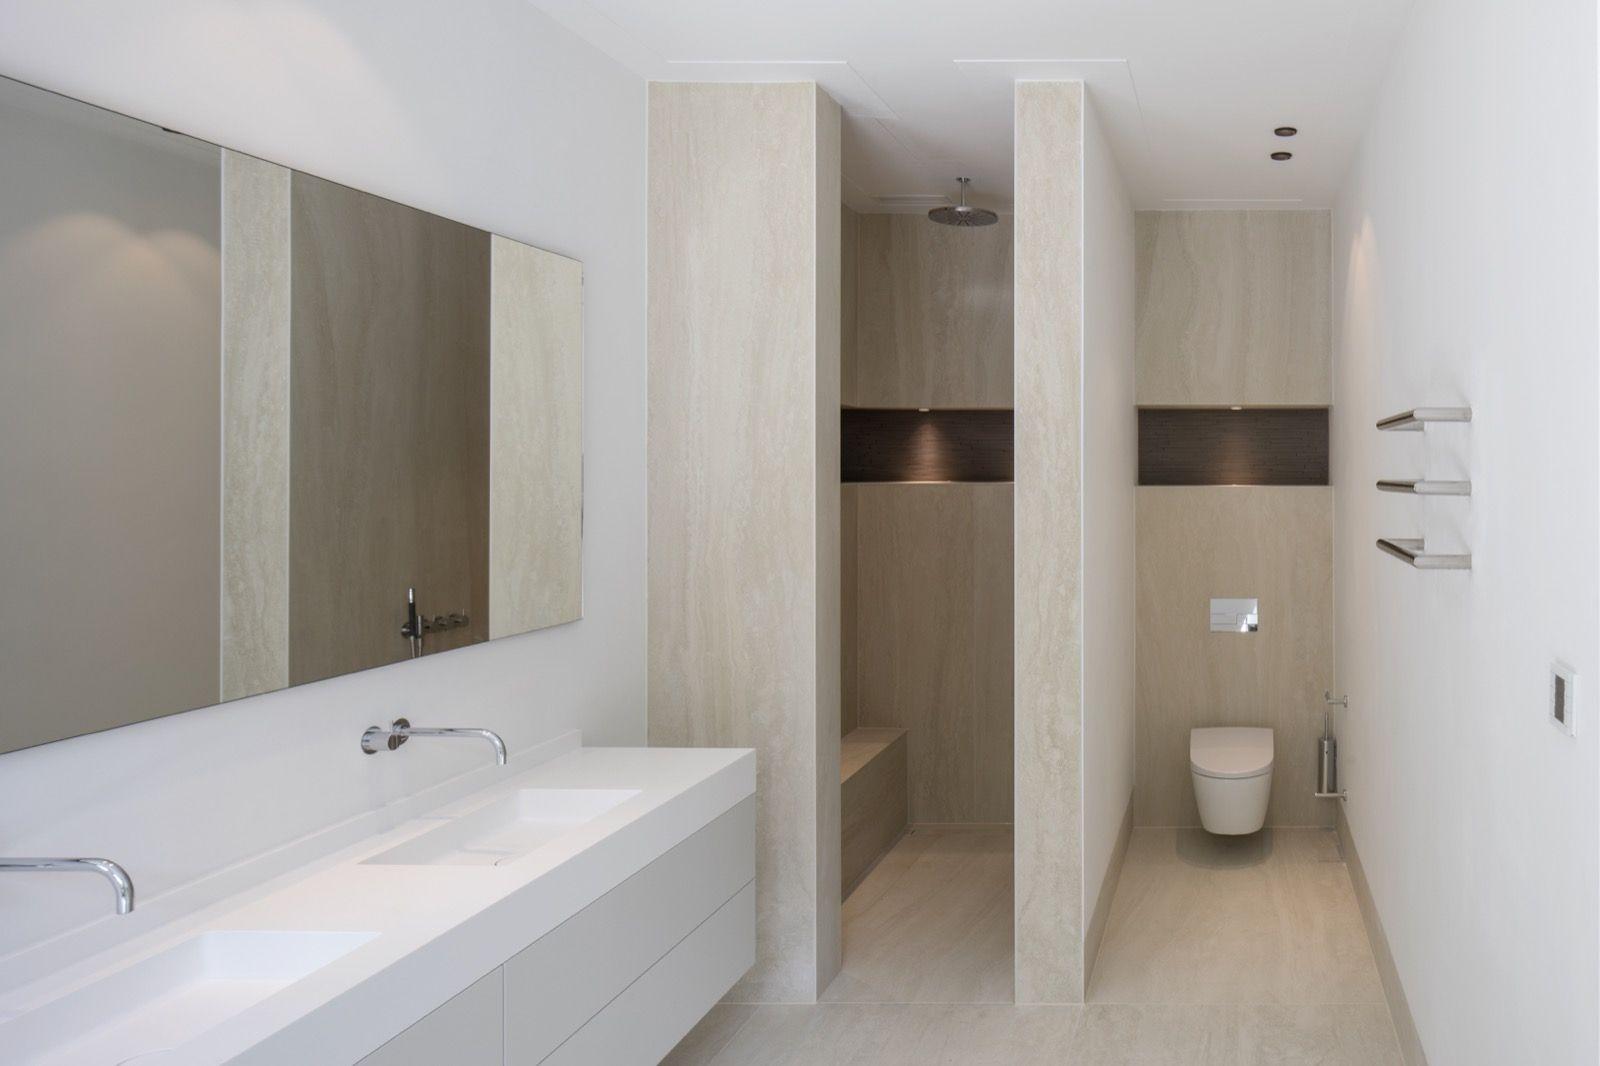 Inloopdouche Met Wastafelblad : Travertin badkamer wastafel betonlook tegels badkamer elegant